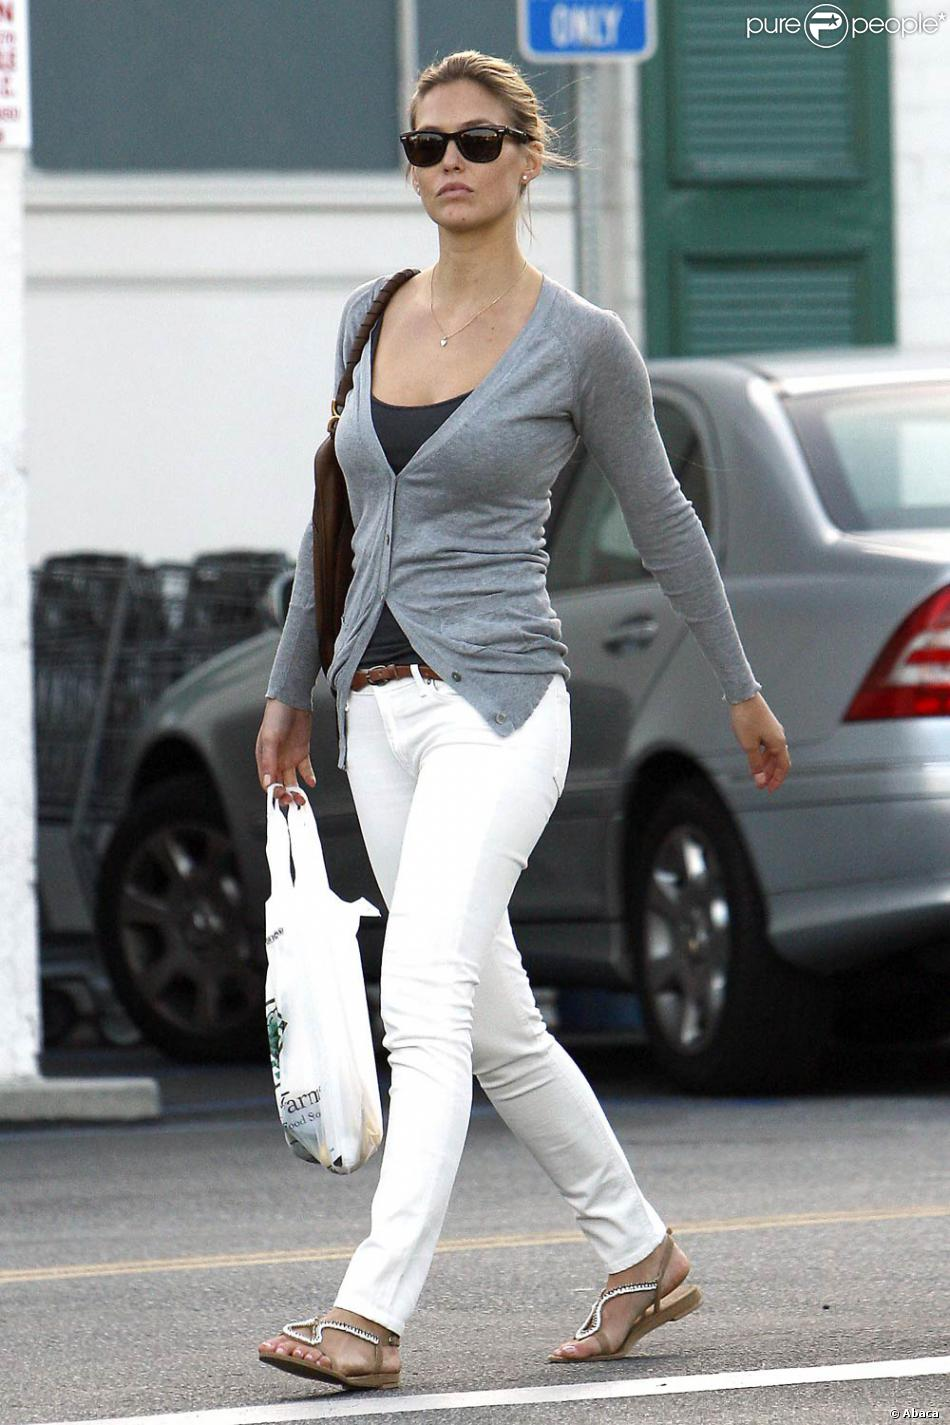 le top model isra lien bar refaeli a succomb la mode du pantalon blanc purepeople. Black Bedroom Furniture Sets. Home Design Ideas